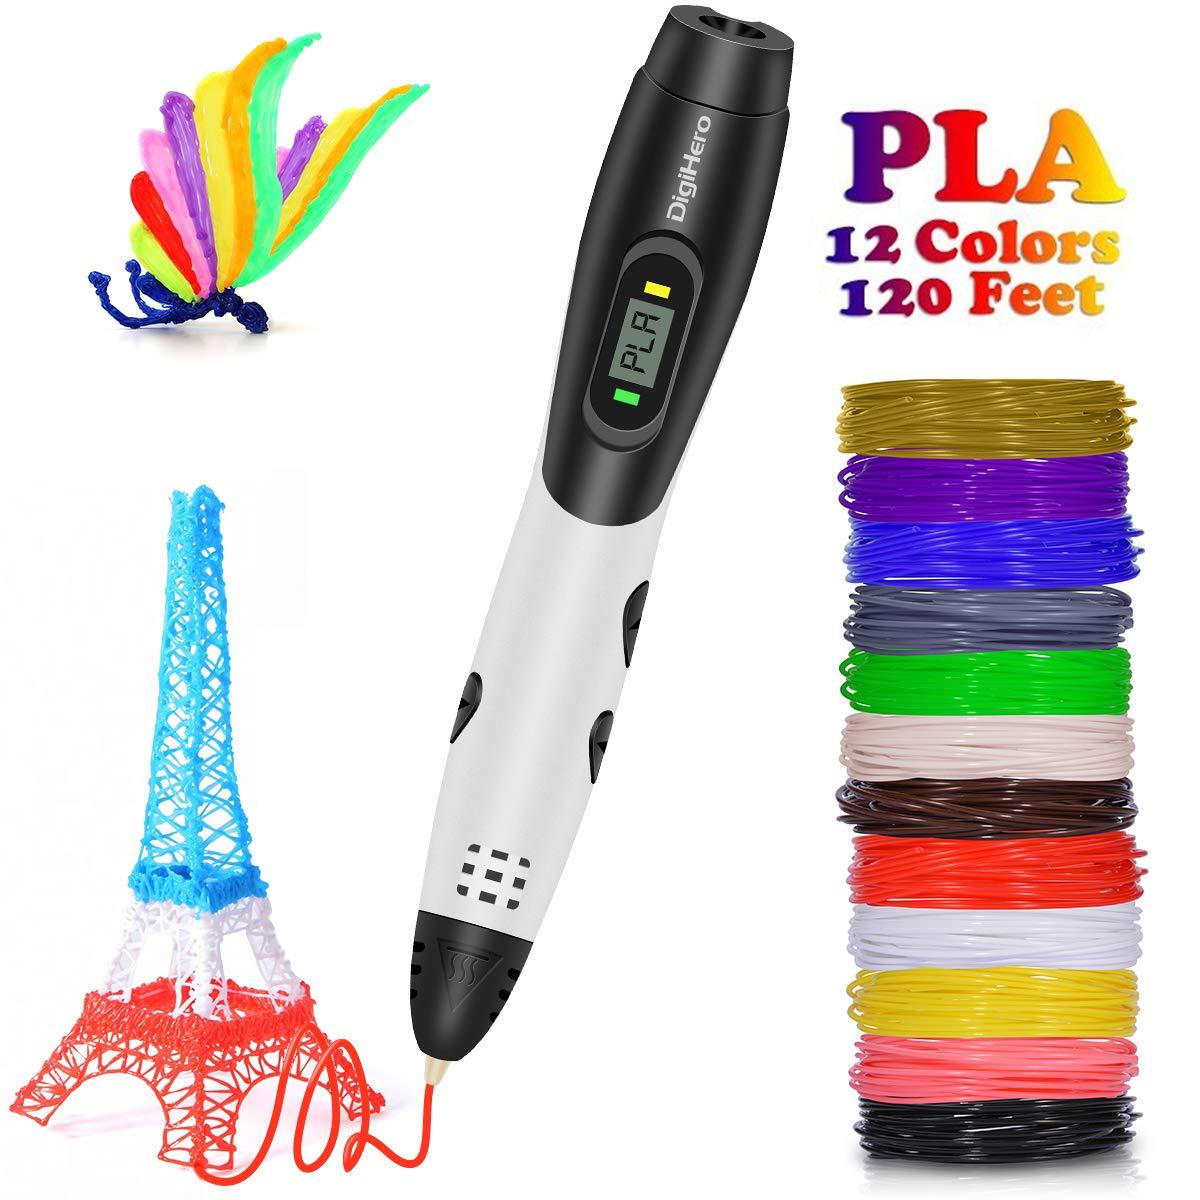 DigiHero 3D Pen Black Friday Deals